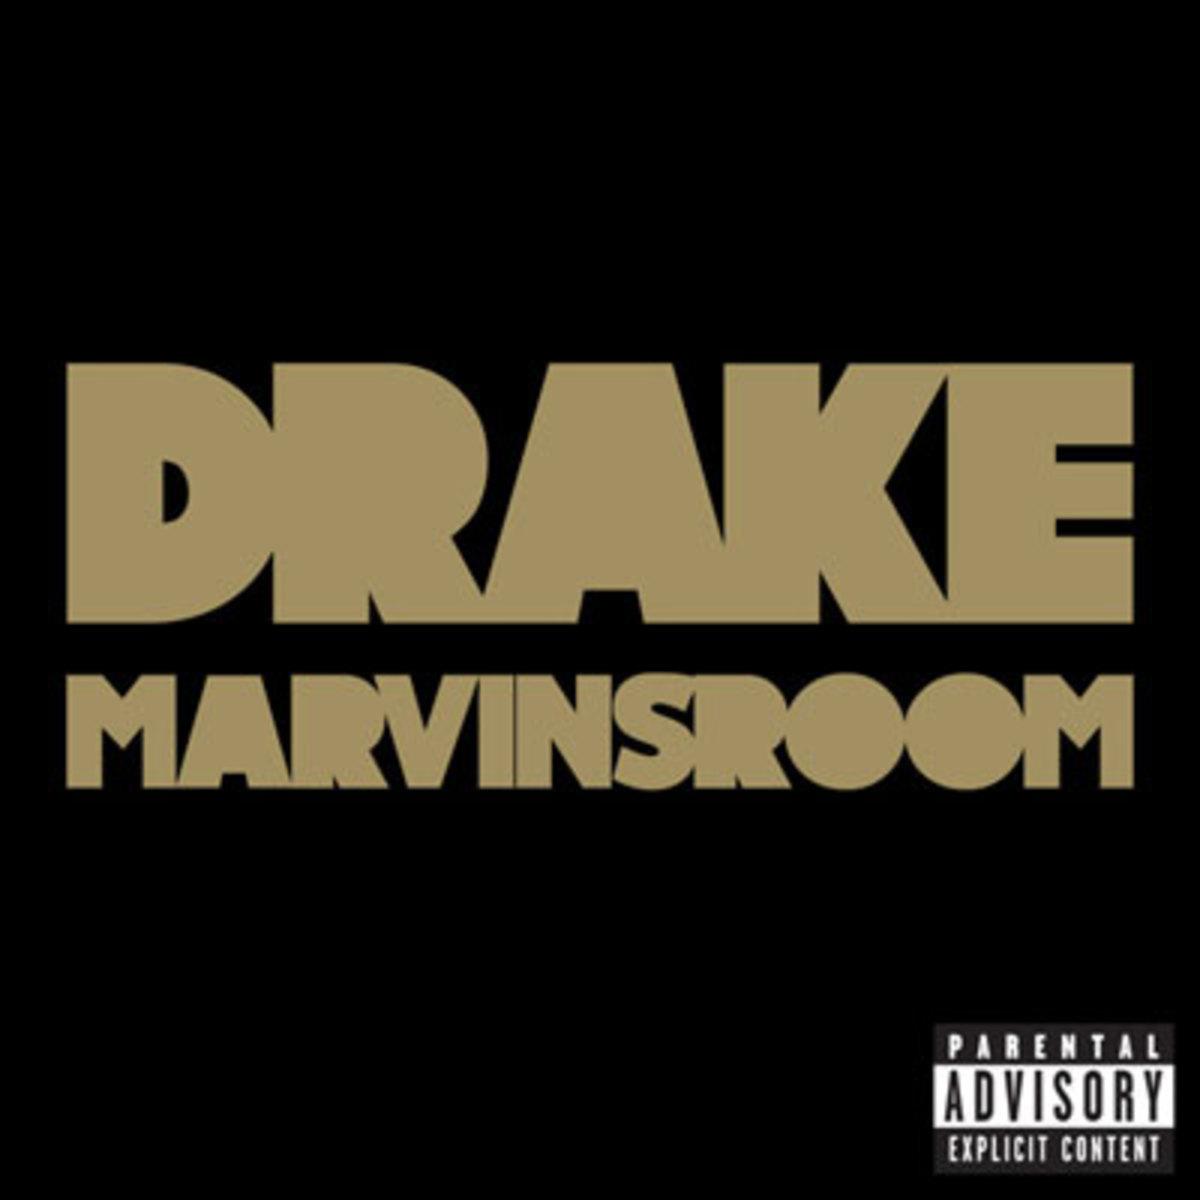 drake-marvinsroom.jpg